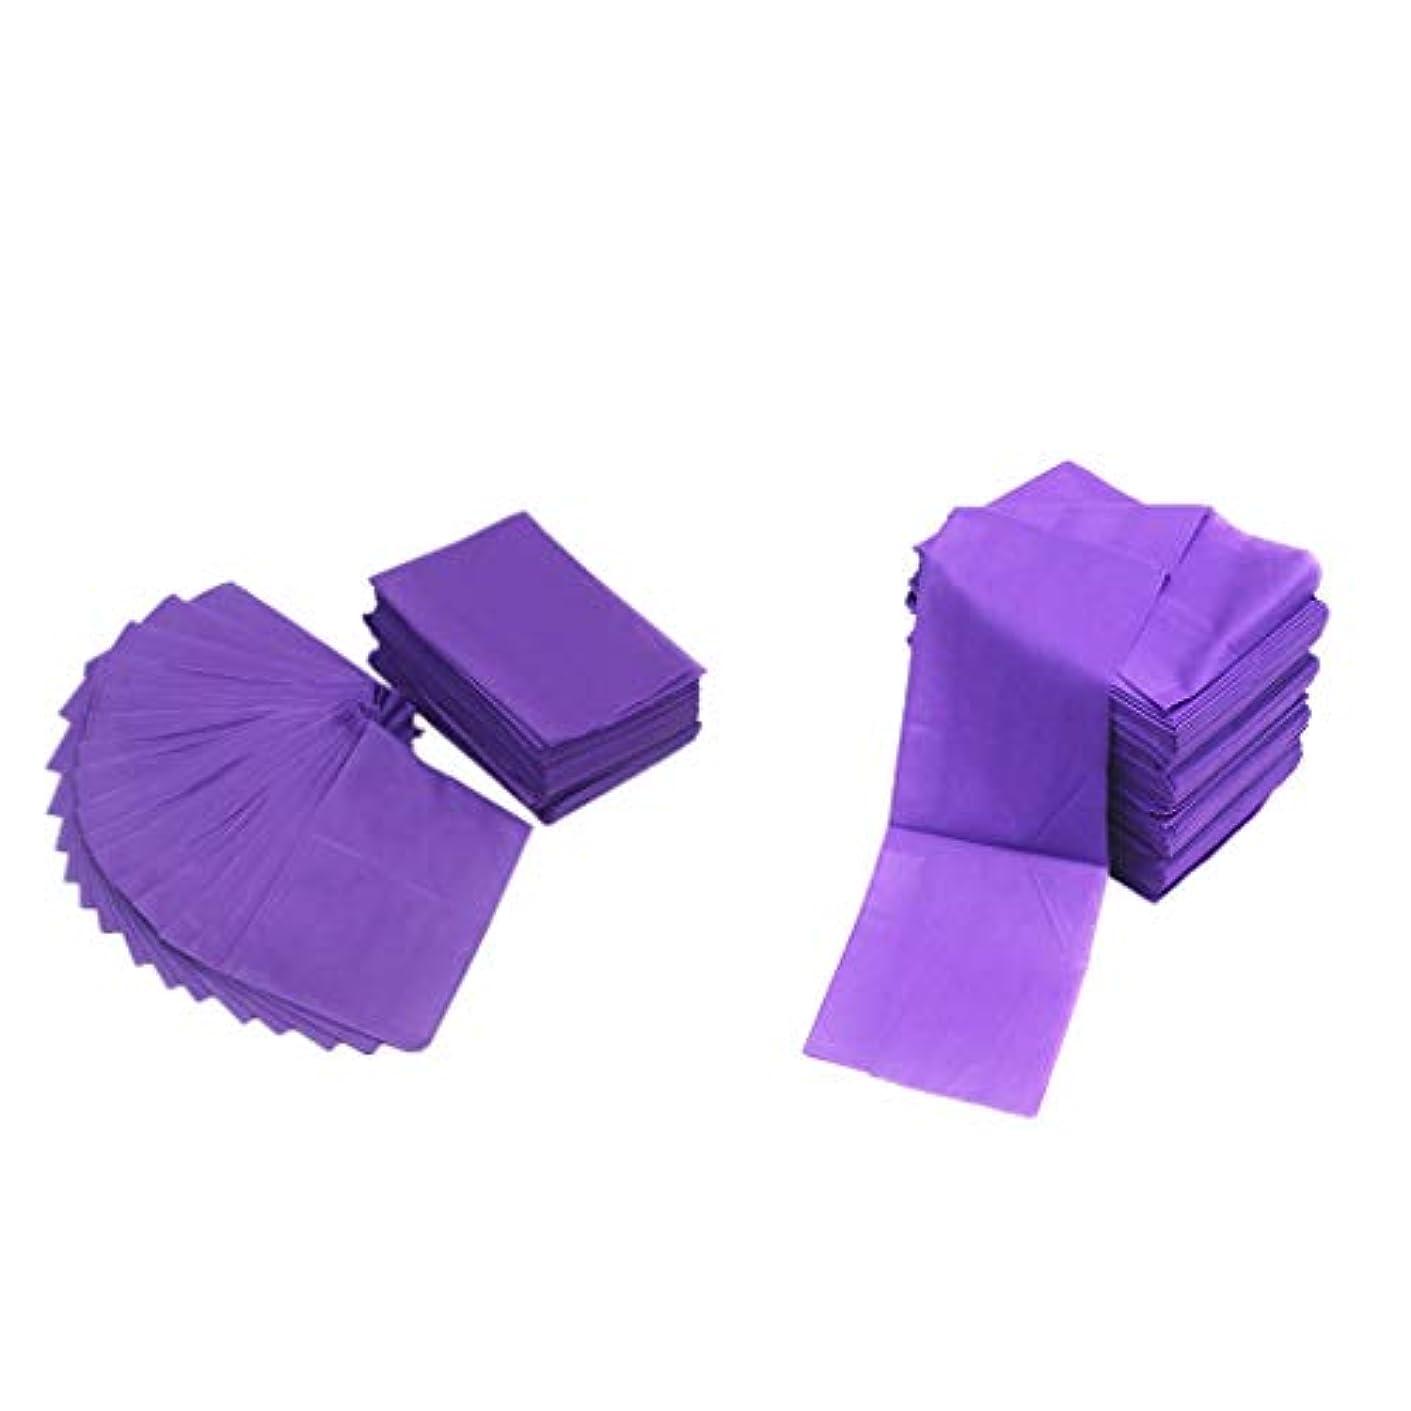 sharprepublic 20ピース不織布使い捨てマッサージテーブルシーツベッドカバー防水パープル